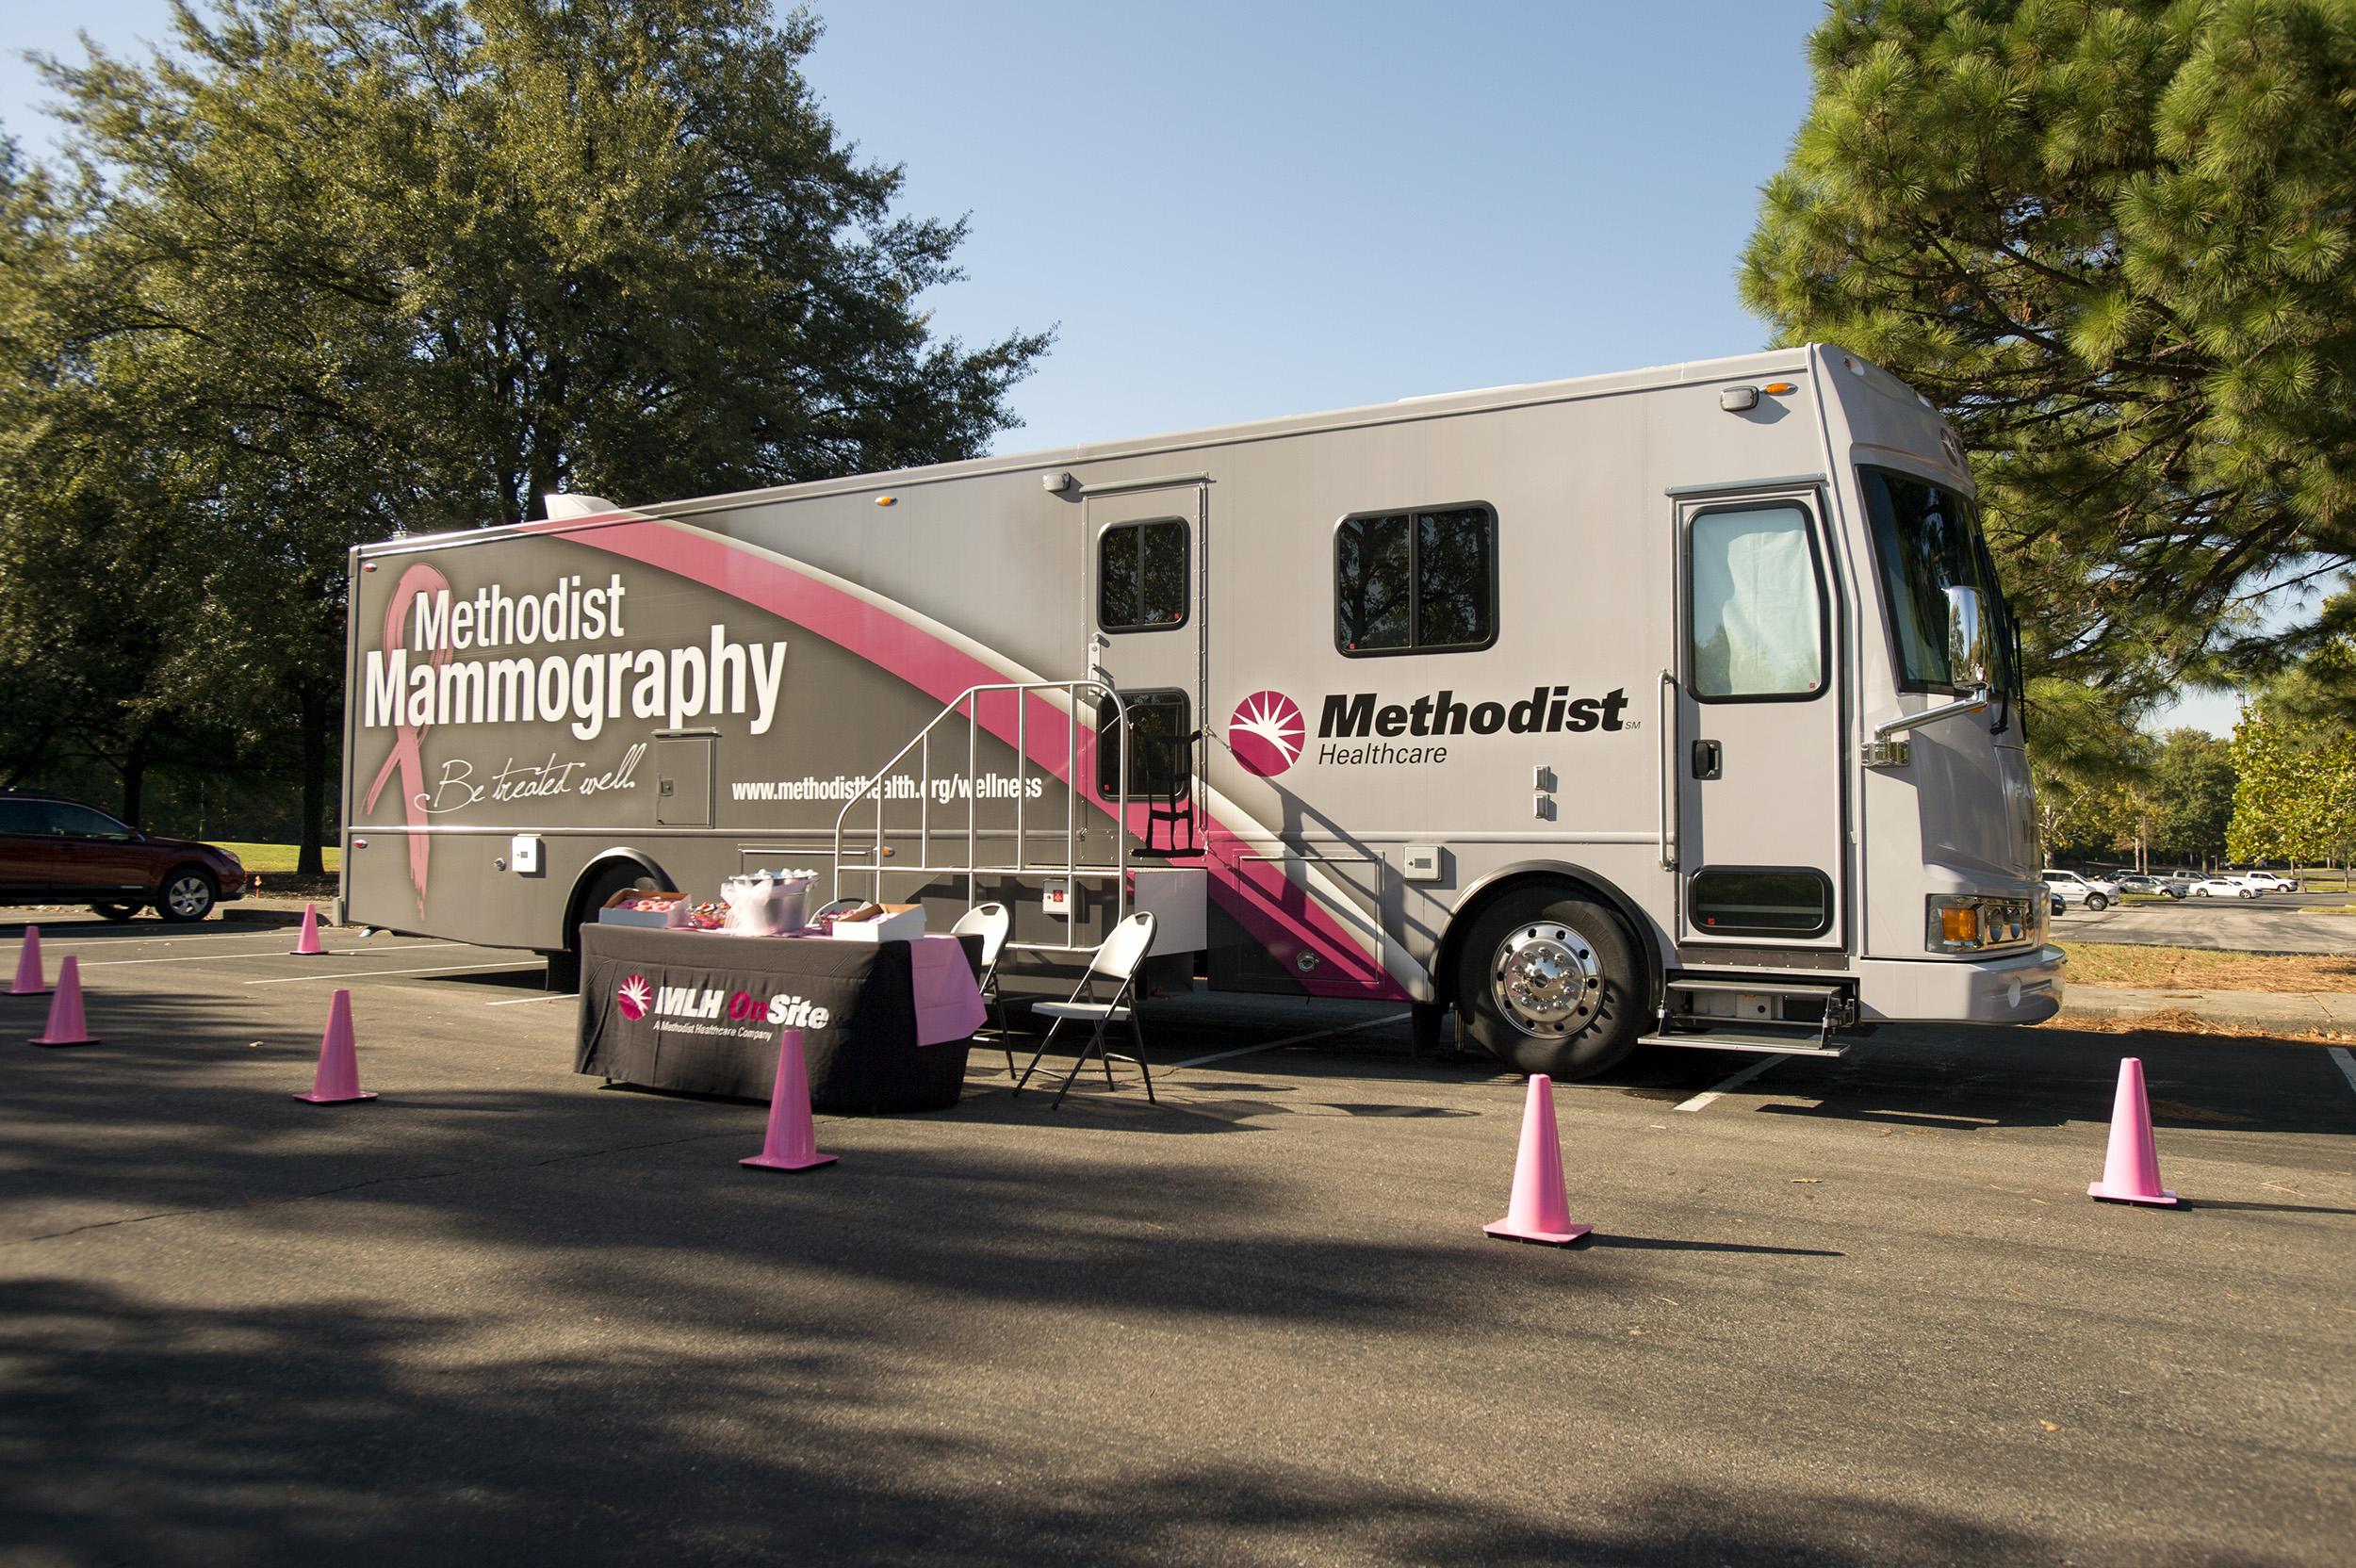 Methodist hospital breast center memphis tn